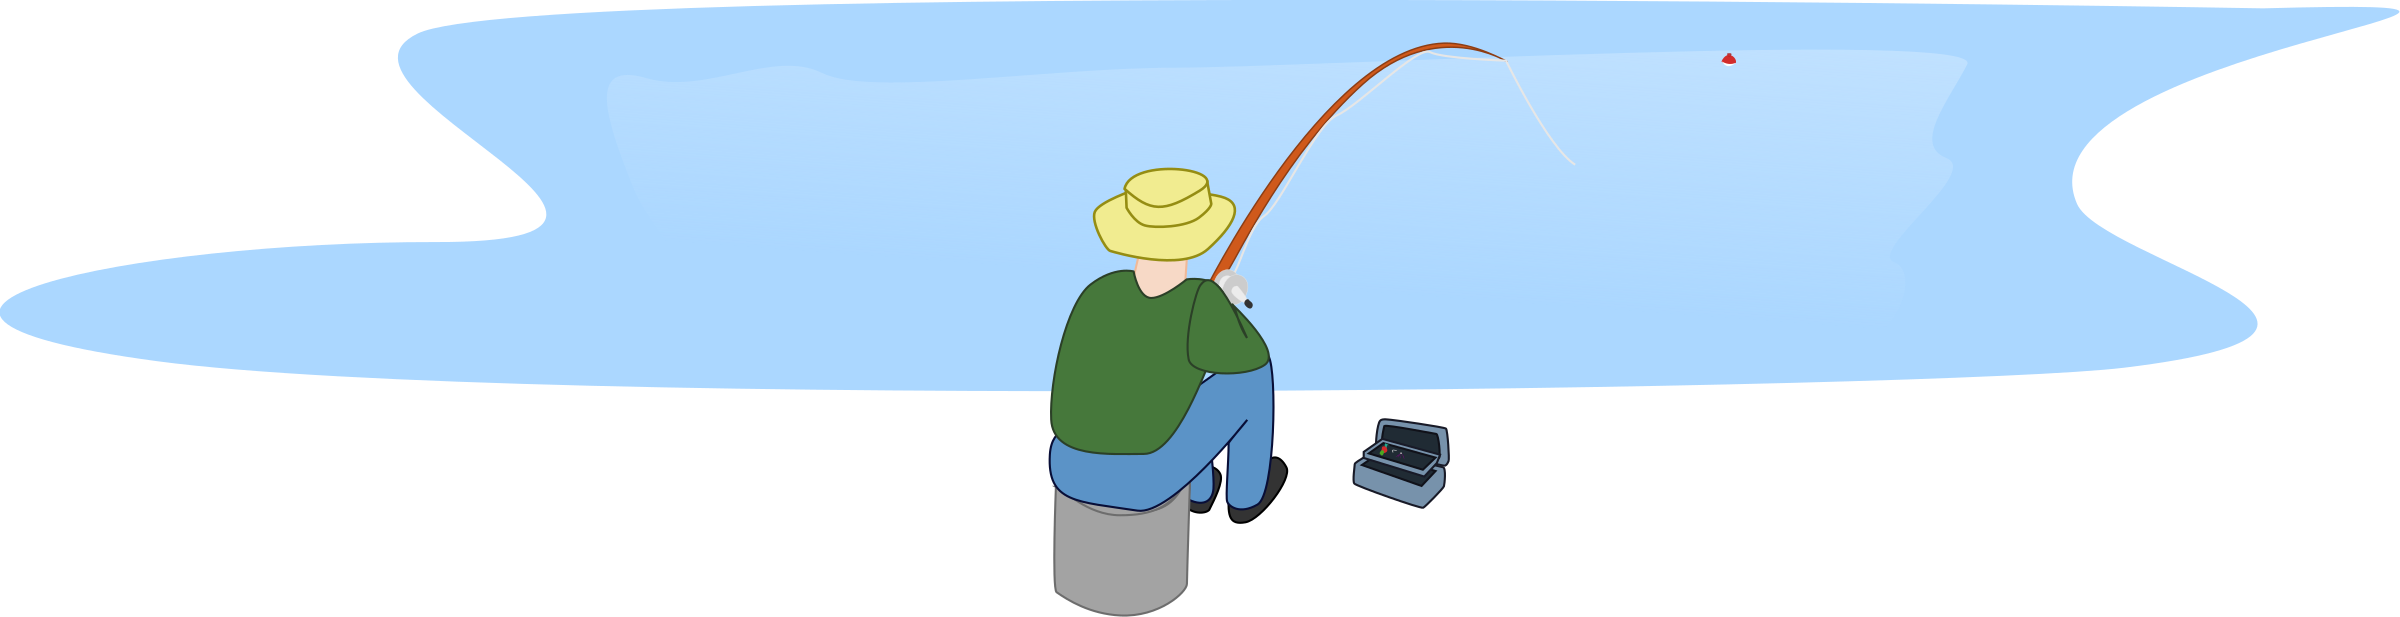 Fishing clipart lake fishing. Fisherman sitting by a